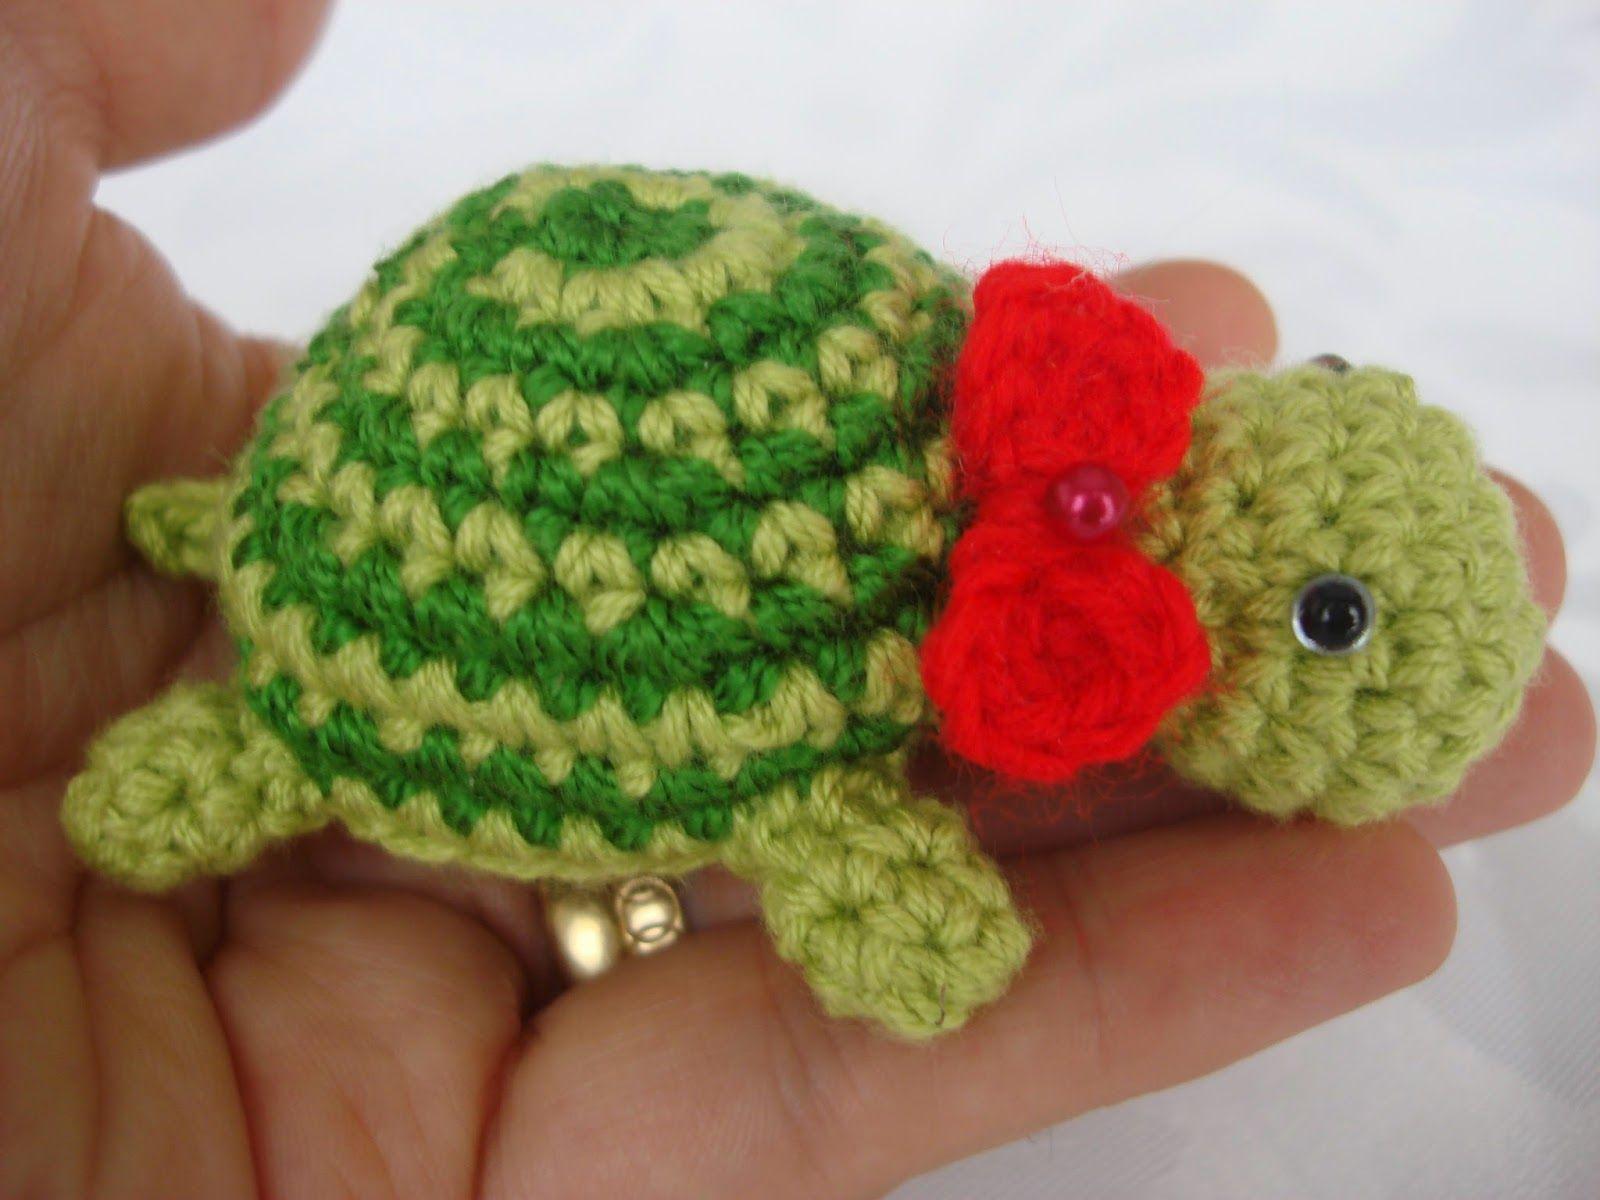 Amigurumi Tortoise Tutorial : Canal crochet amigurumi tortuga pequeñita amigurumis